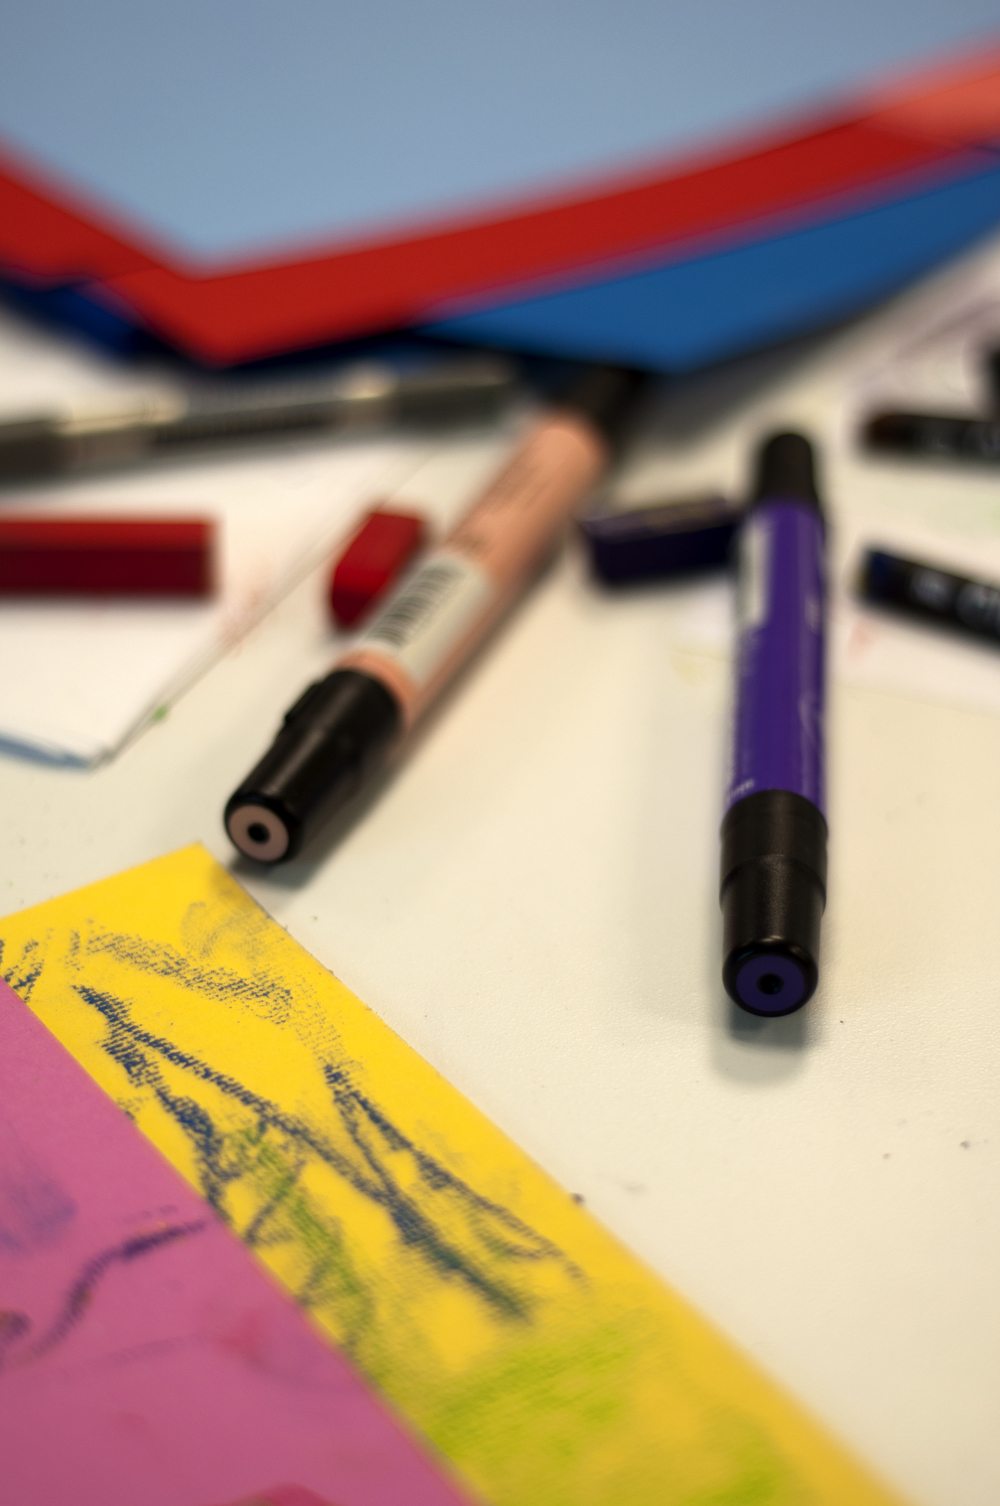 pencils_2.jpg